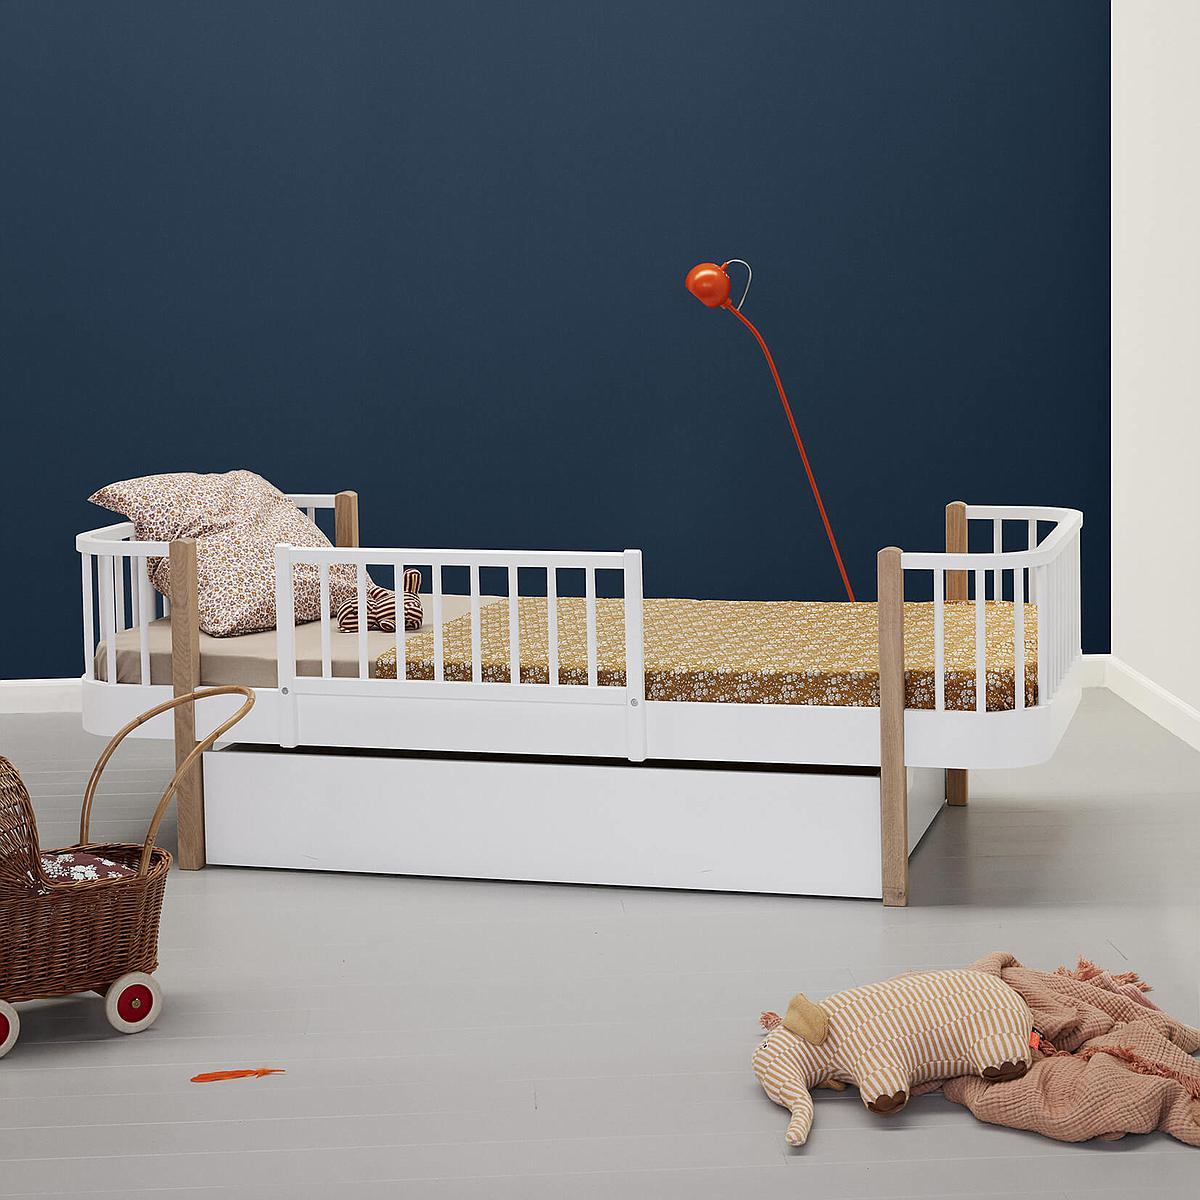 Cama individual evolutiva 90x200cm WOOD ORIGINAL Oliver Furniture blanco